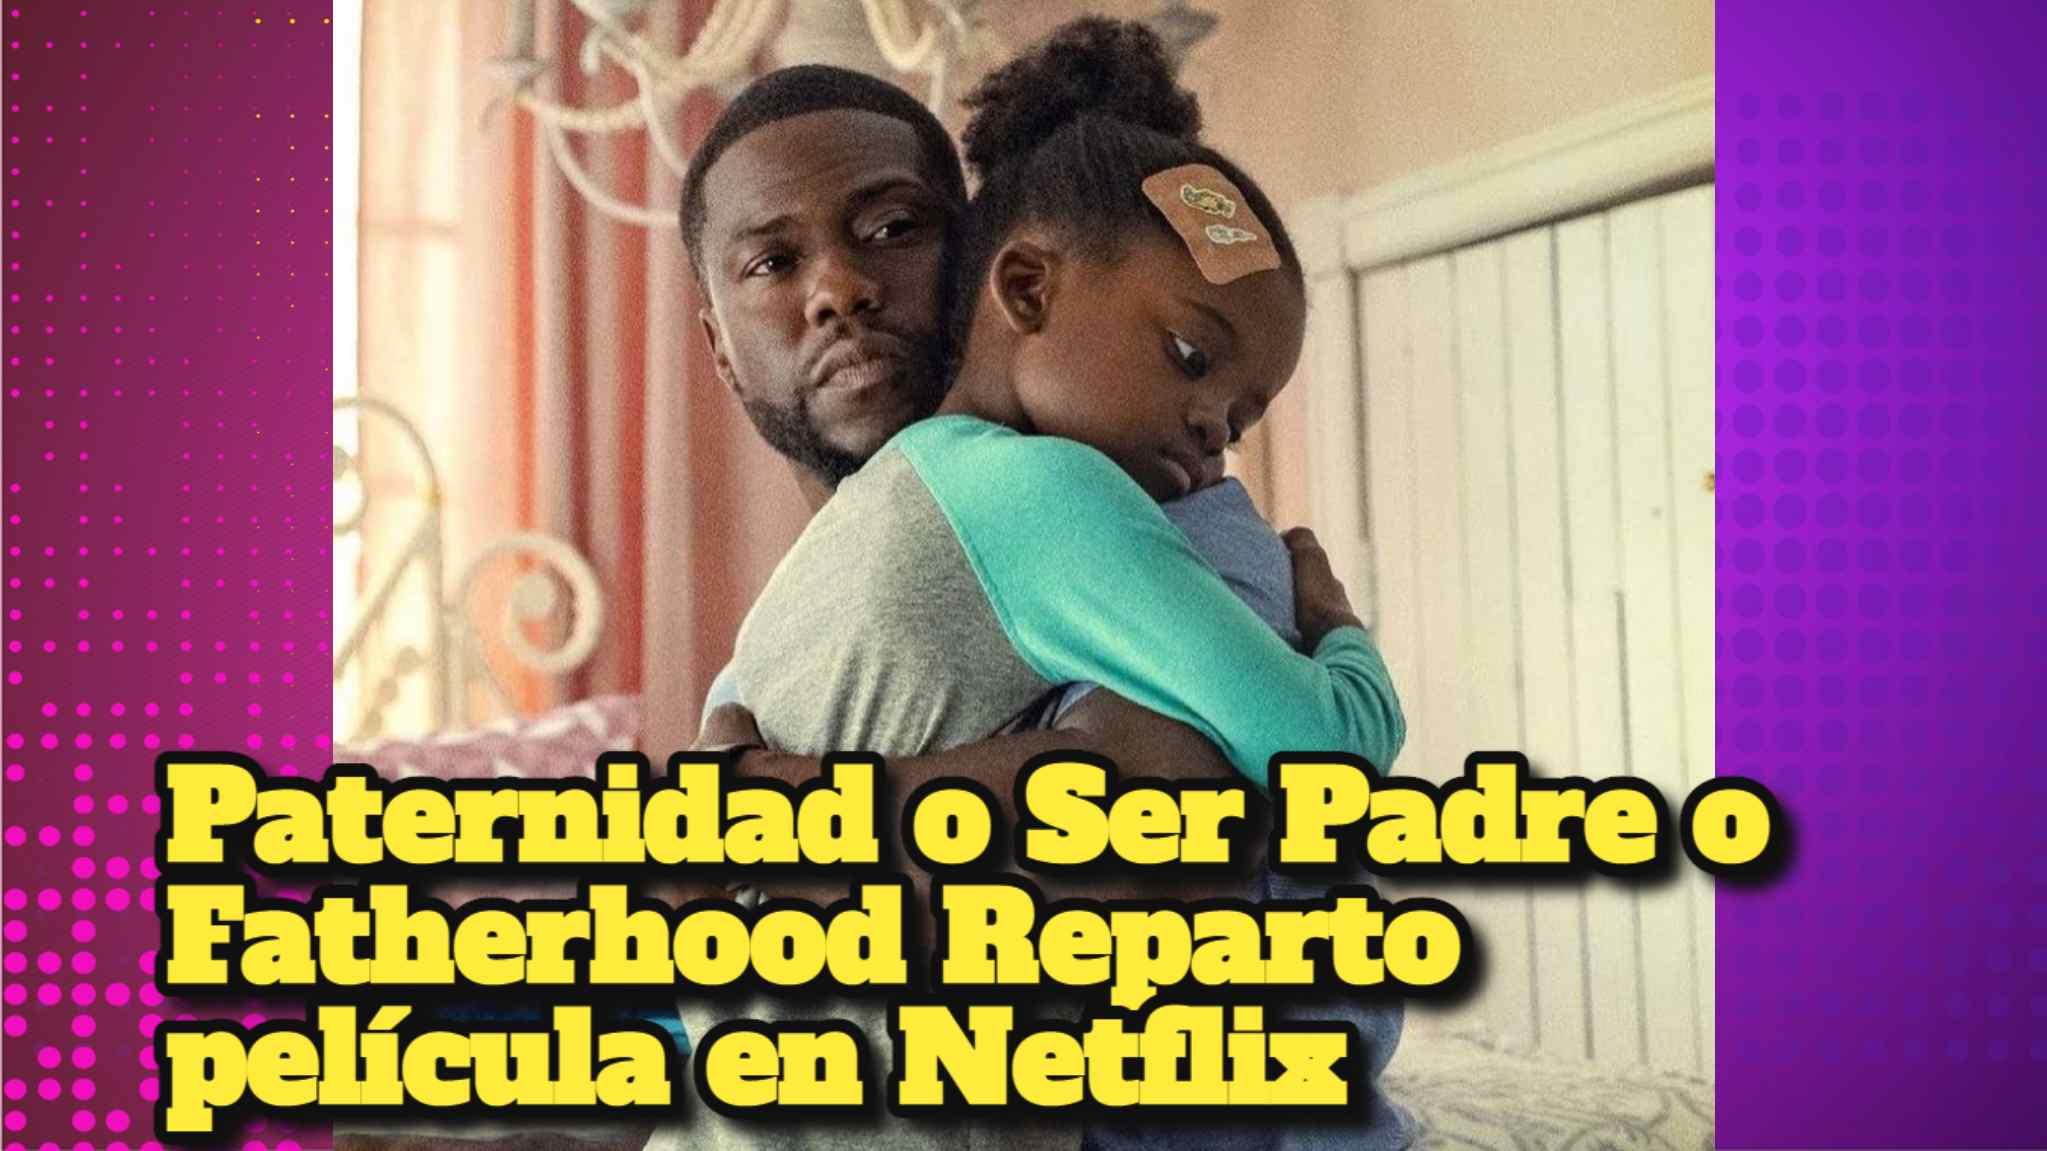 Paternidad o Ser Padre o Fatherhood Reparto película en Netflix